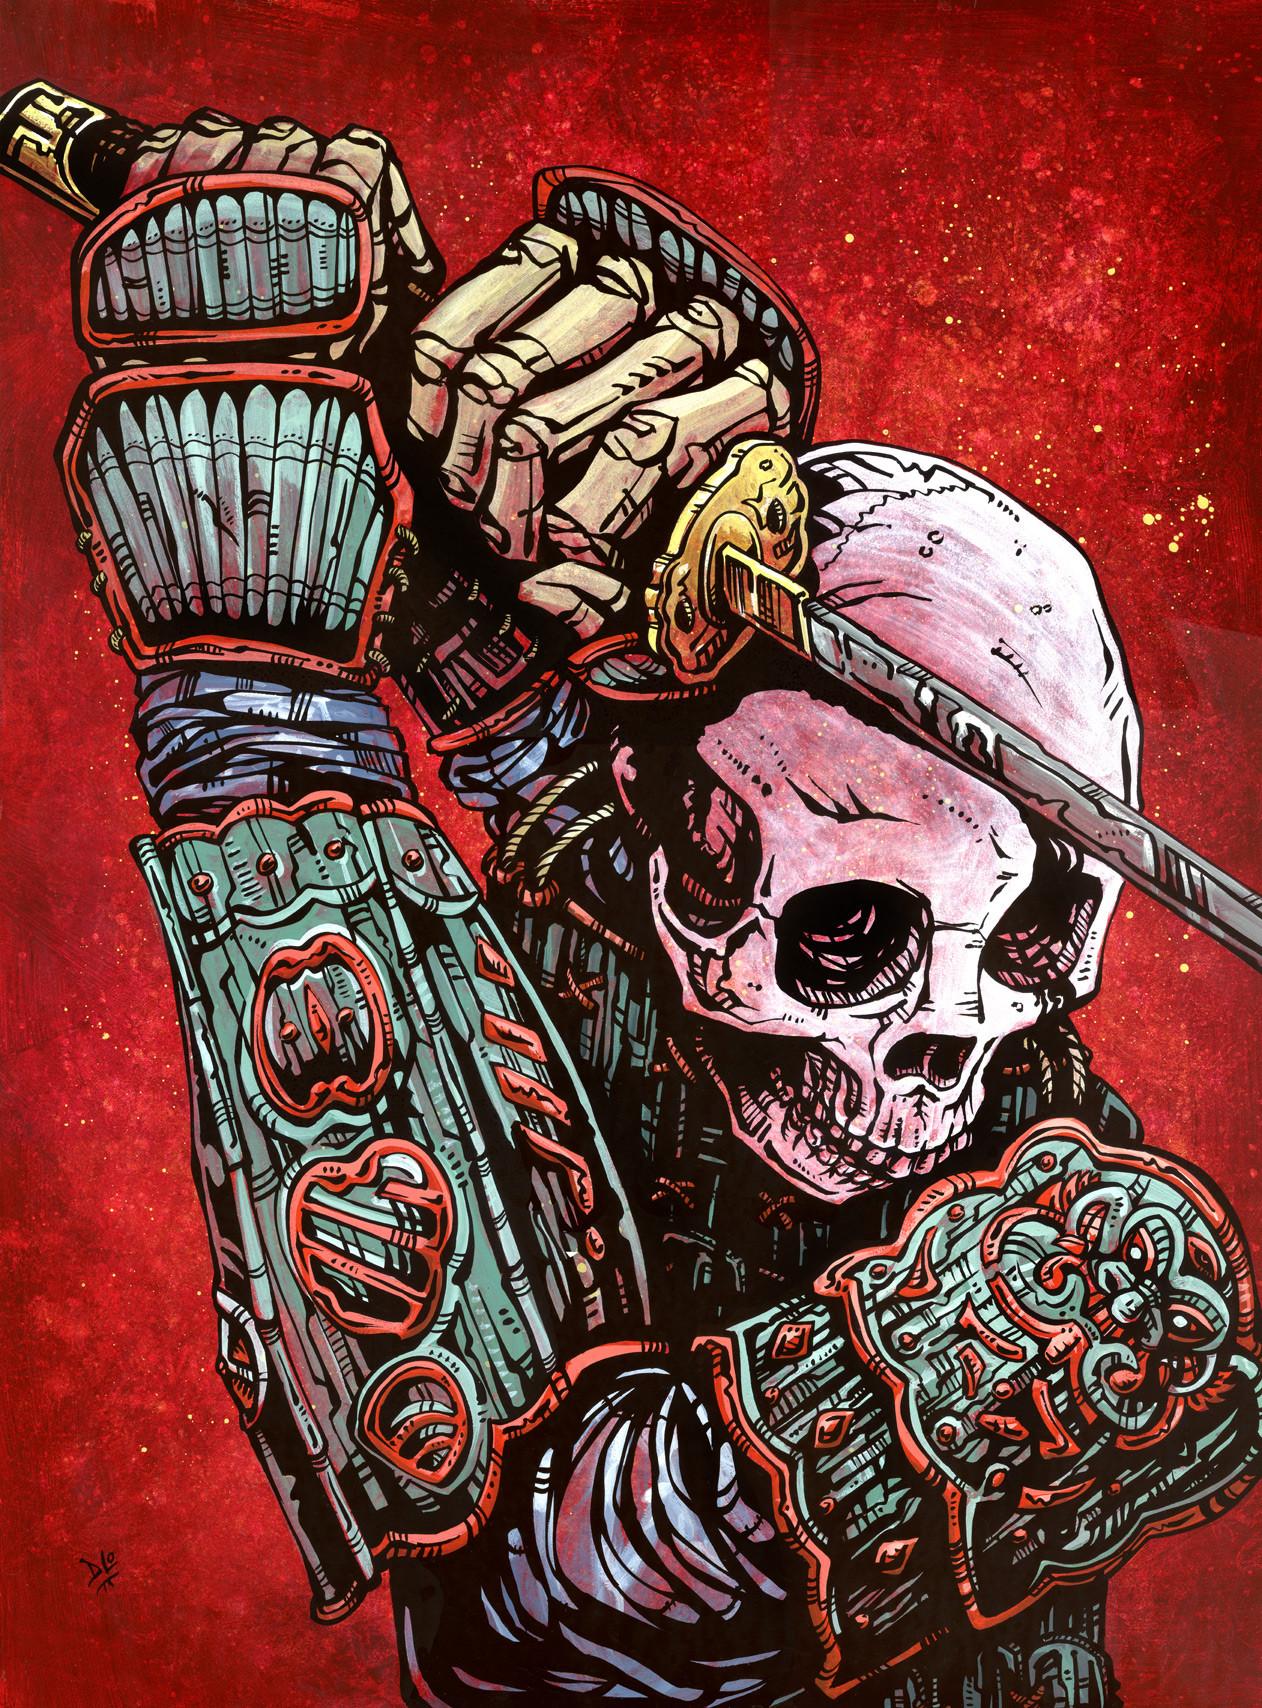 Drawn samurai dead Deadly Process with warrior exudes